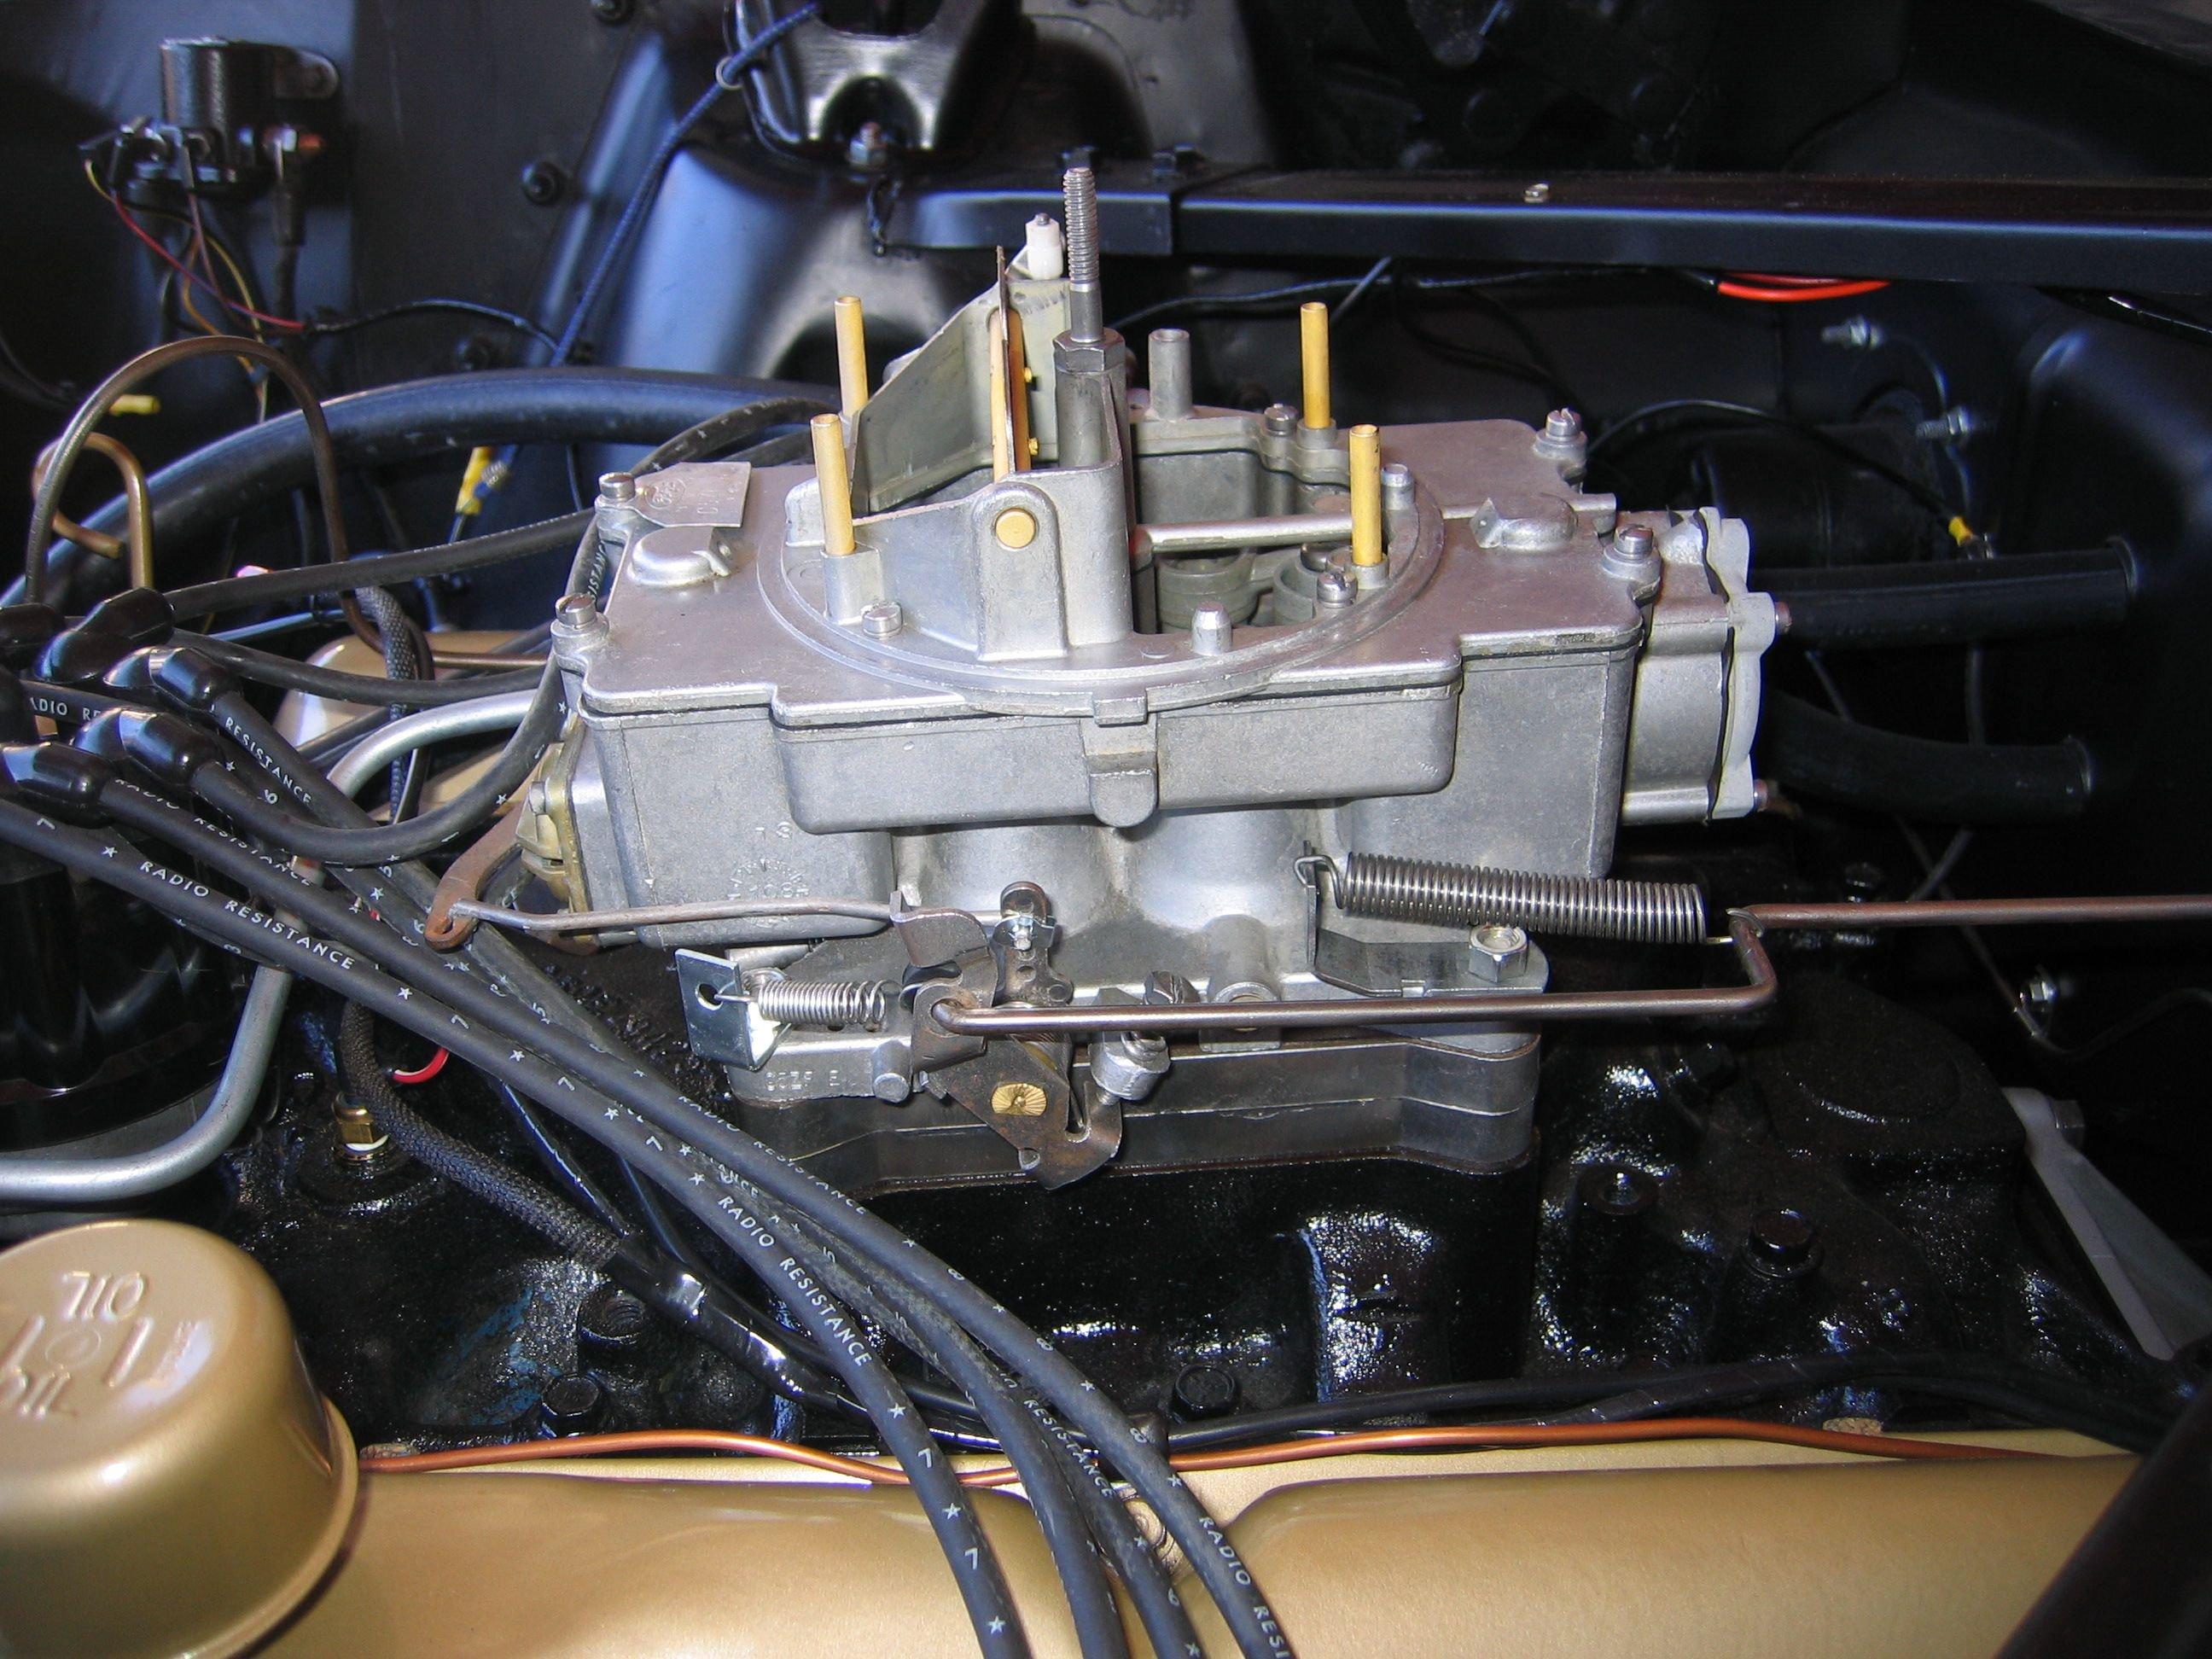 65 Ford Mustang >> Double throttle return spring for a 1964 1/2 Mustang - Ford Mustang Forum